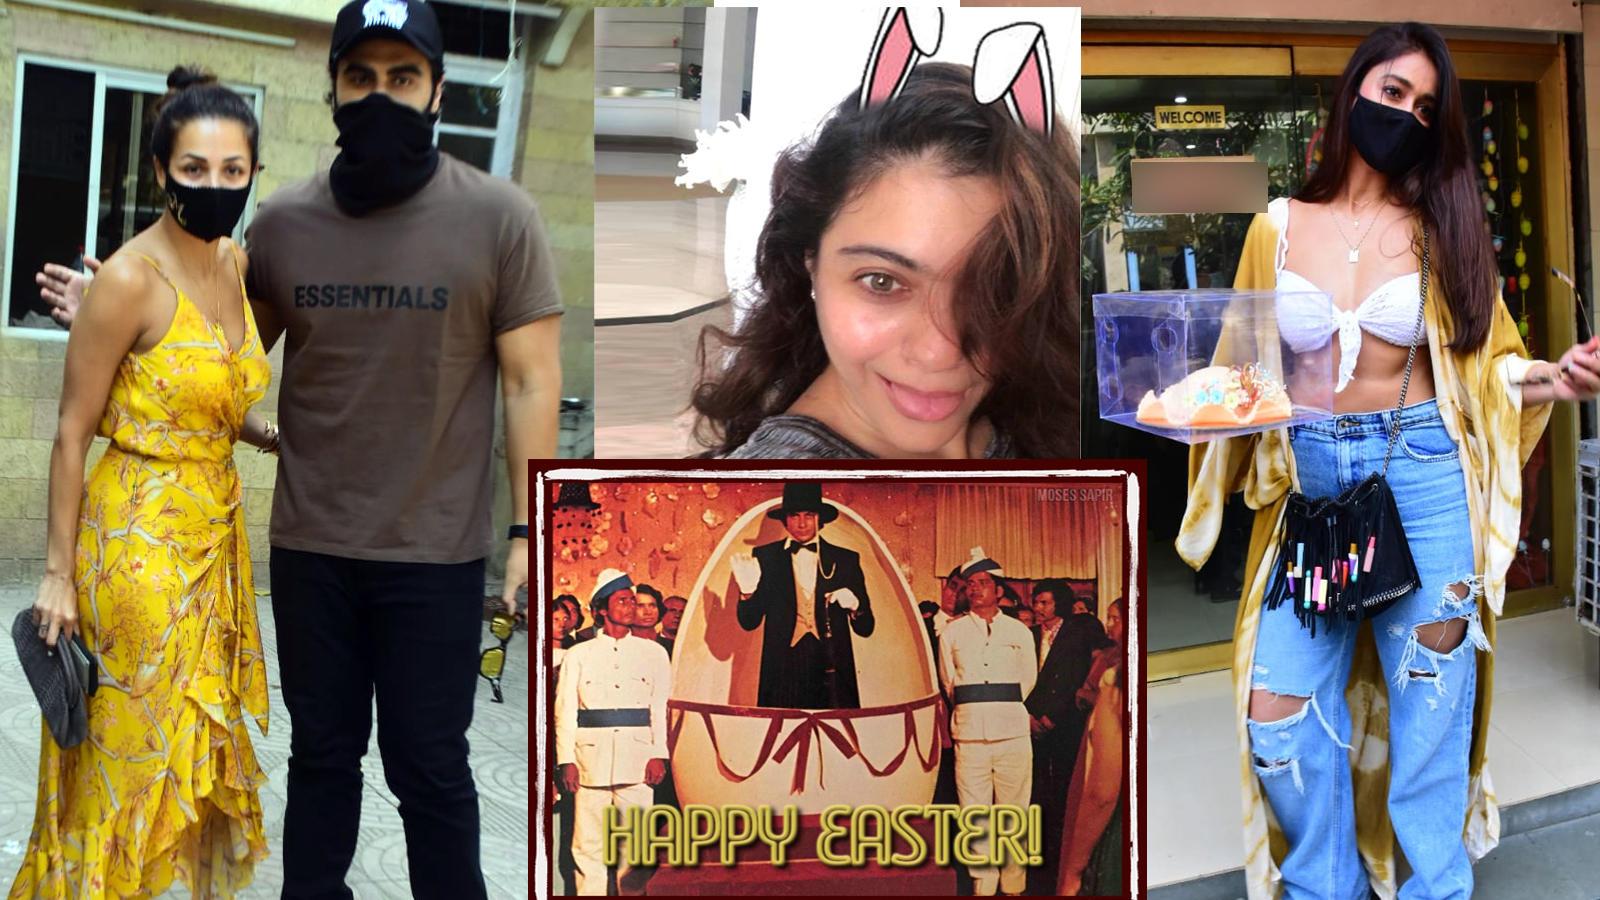 Happy Easter! From Amitabh Bachchan, Ileana D'Cruz to Malaika Arora, Arjun Kapoor, celebs extend warm greetings | Hindi Movie News – Bollywood – Times of India